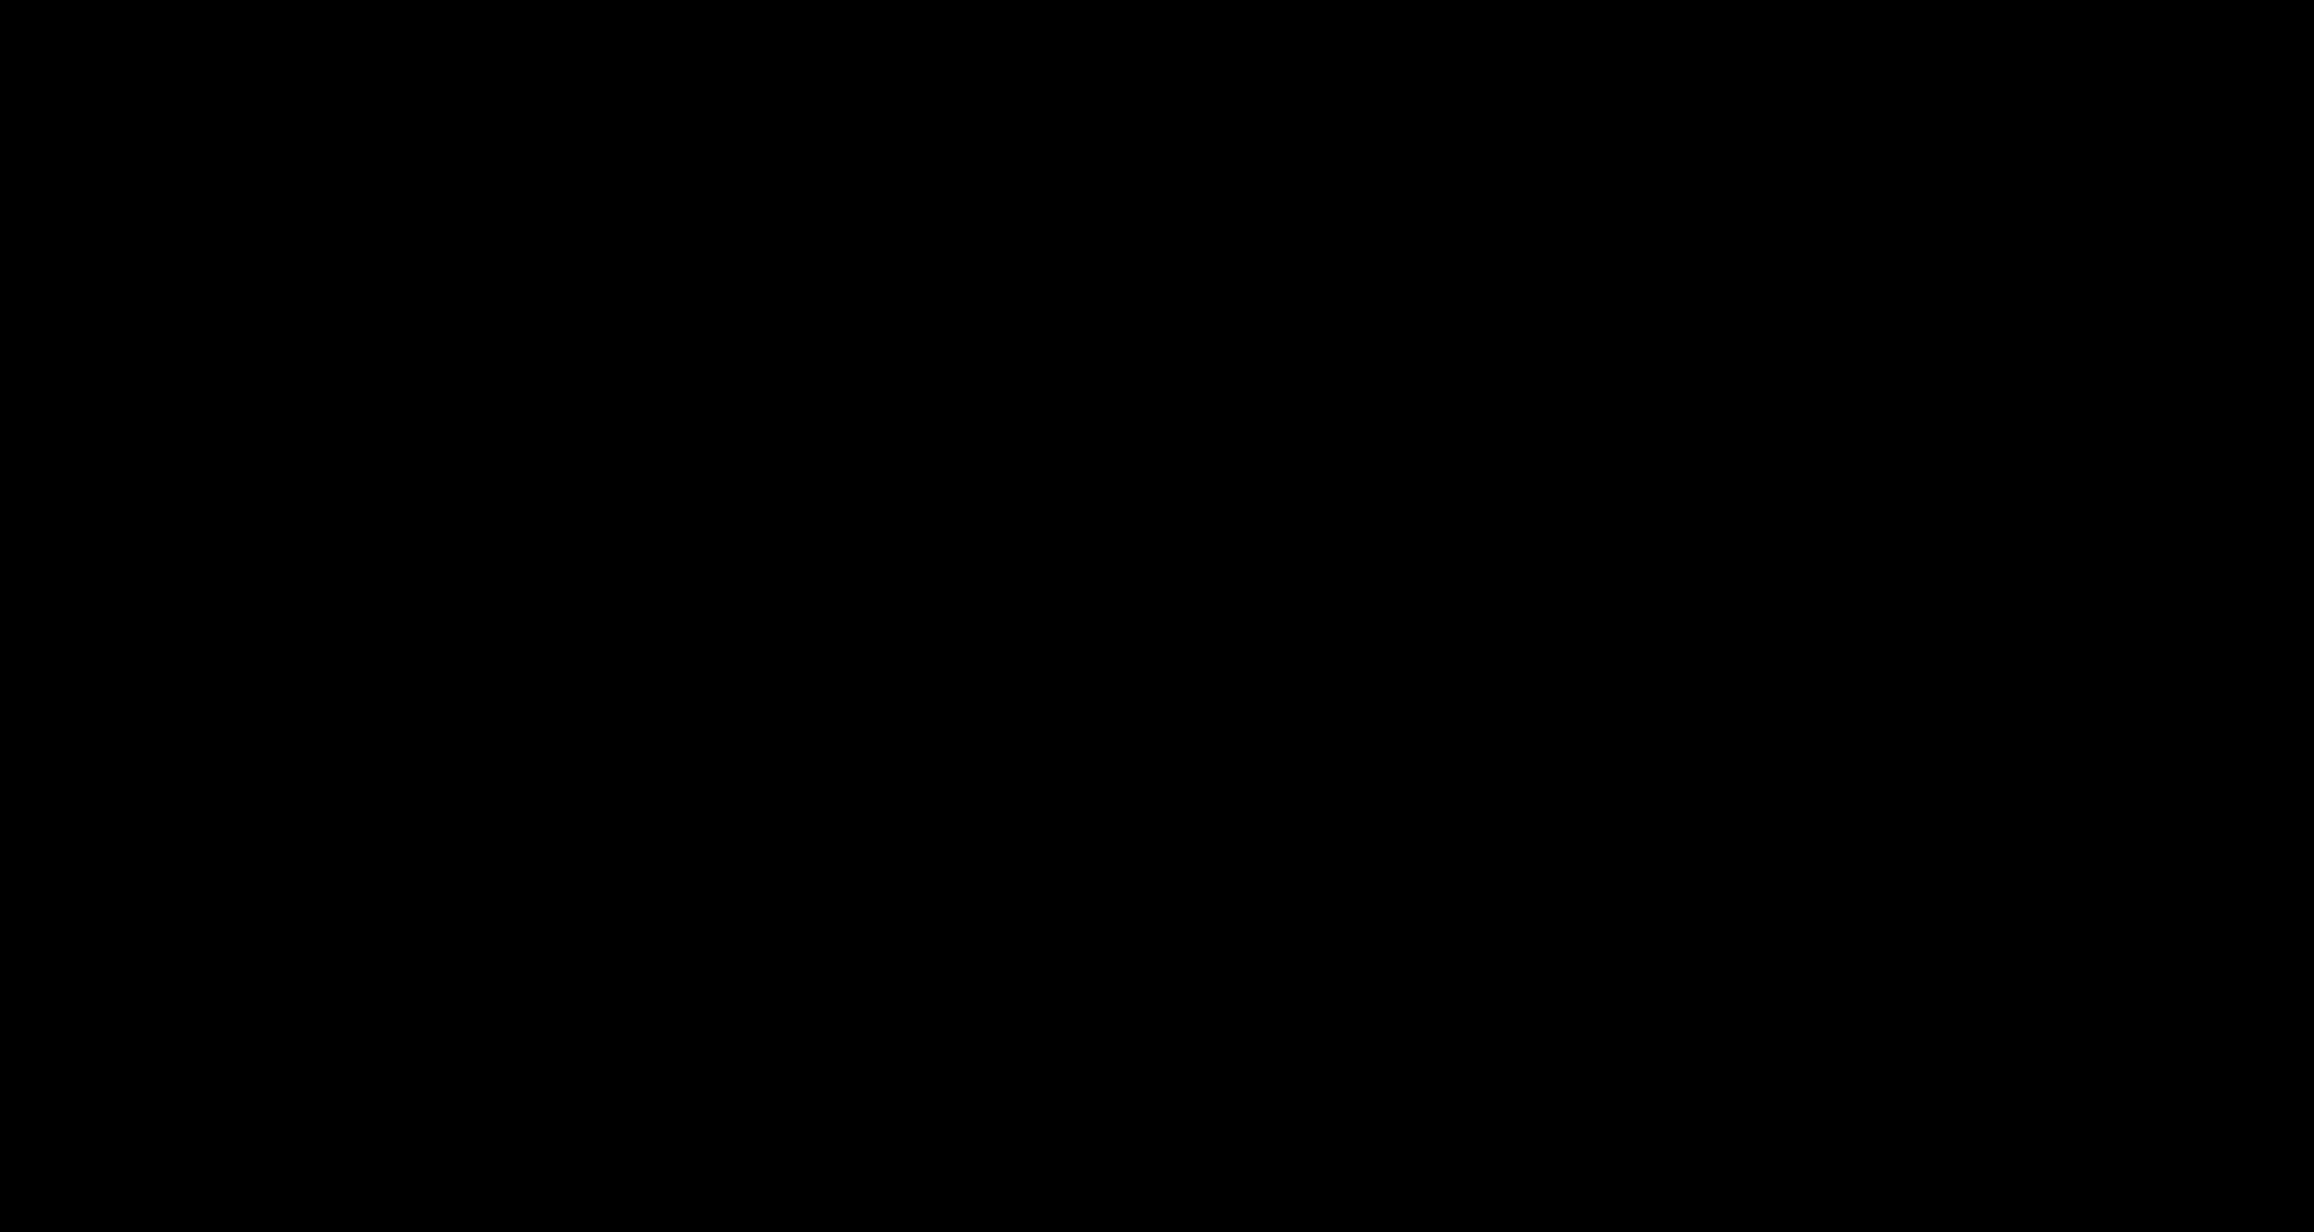 Videotutoriales sobre simulación por elementos finitos con Simcenter FEMAP.